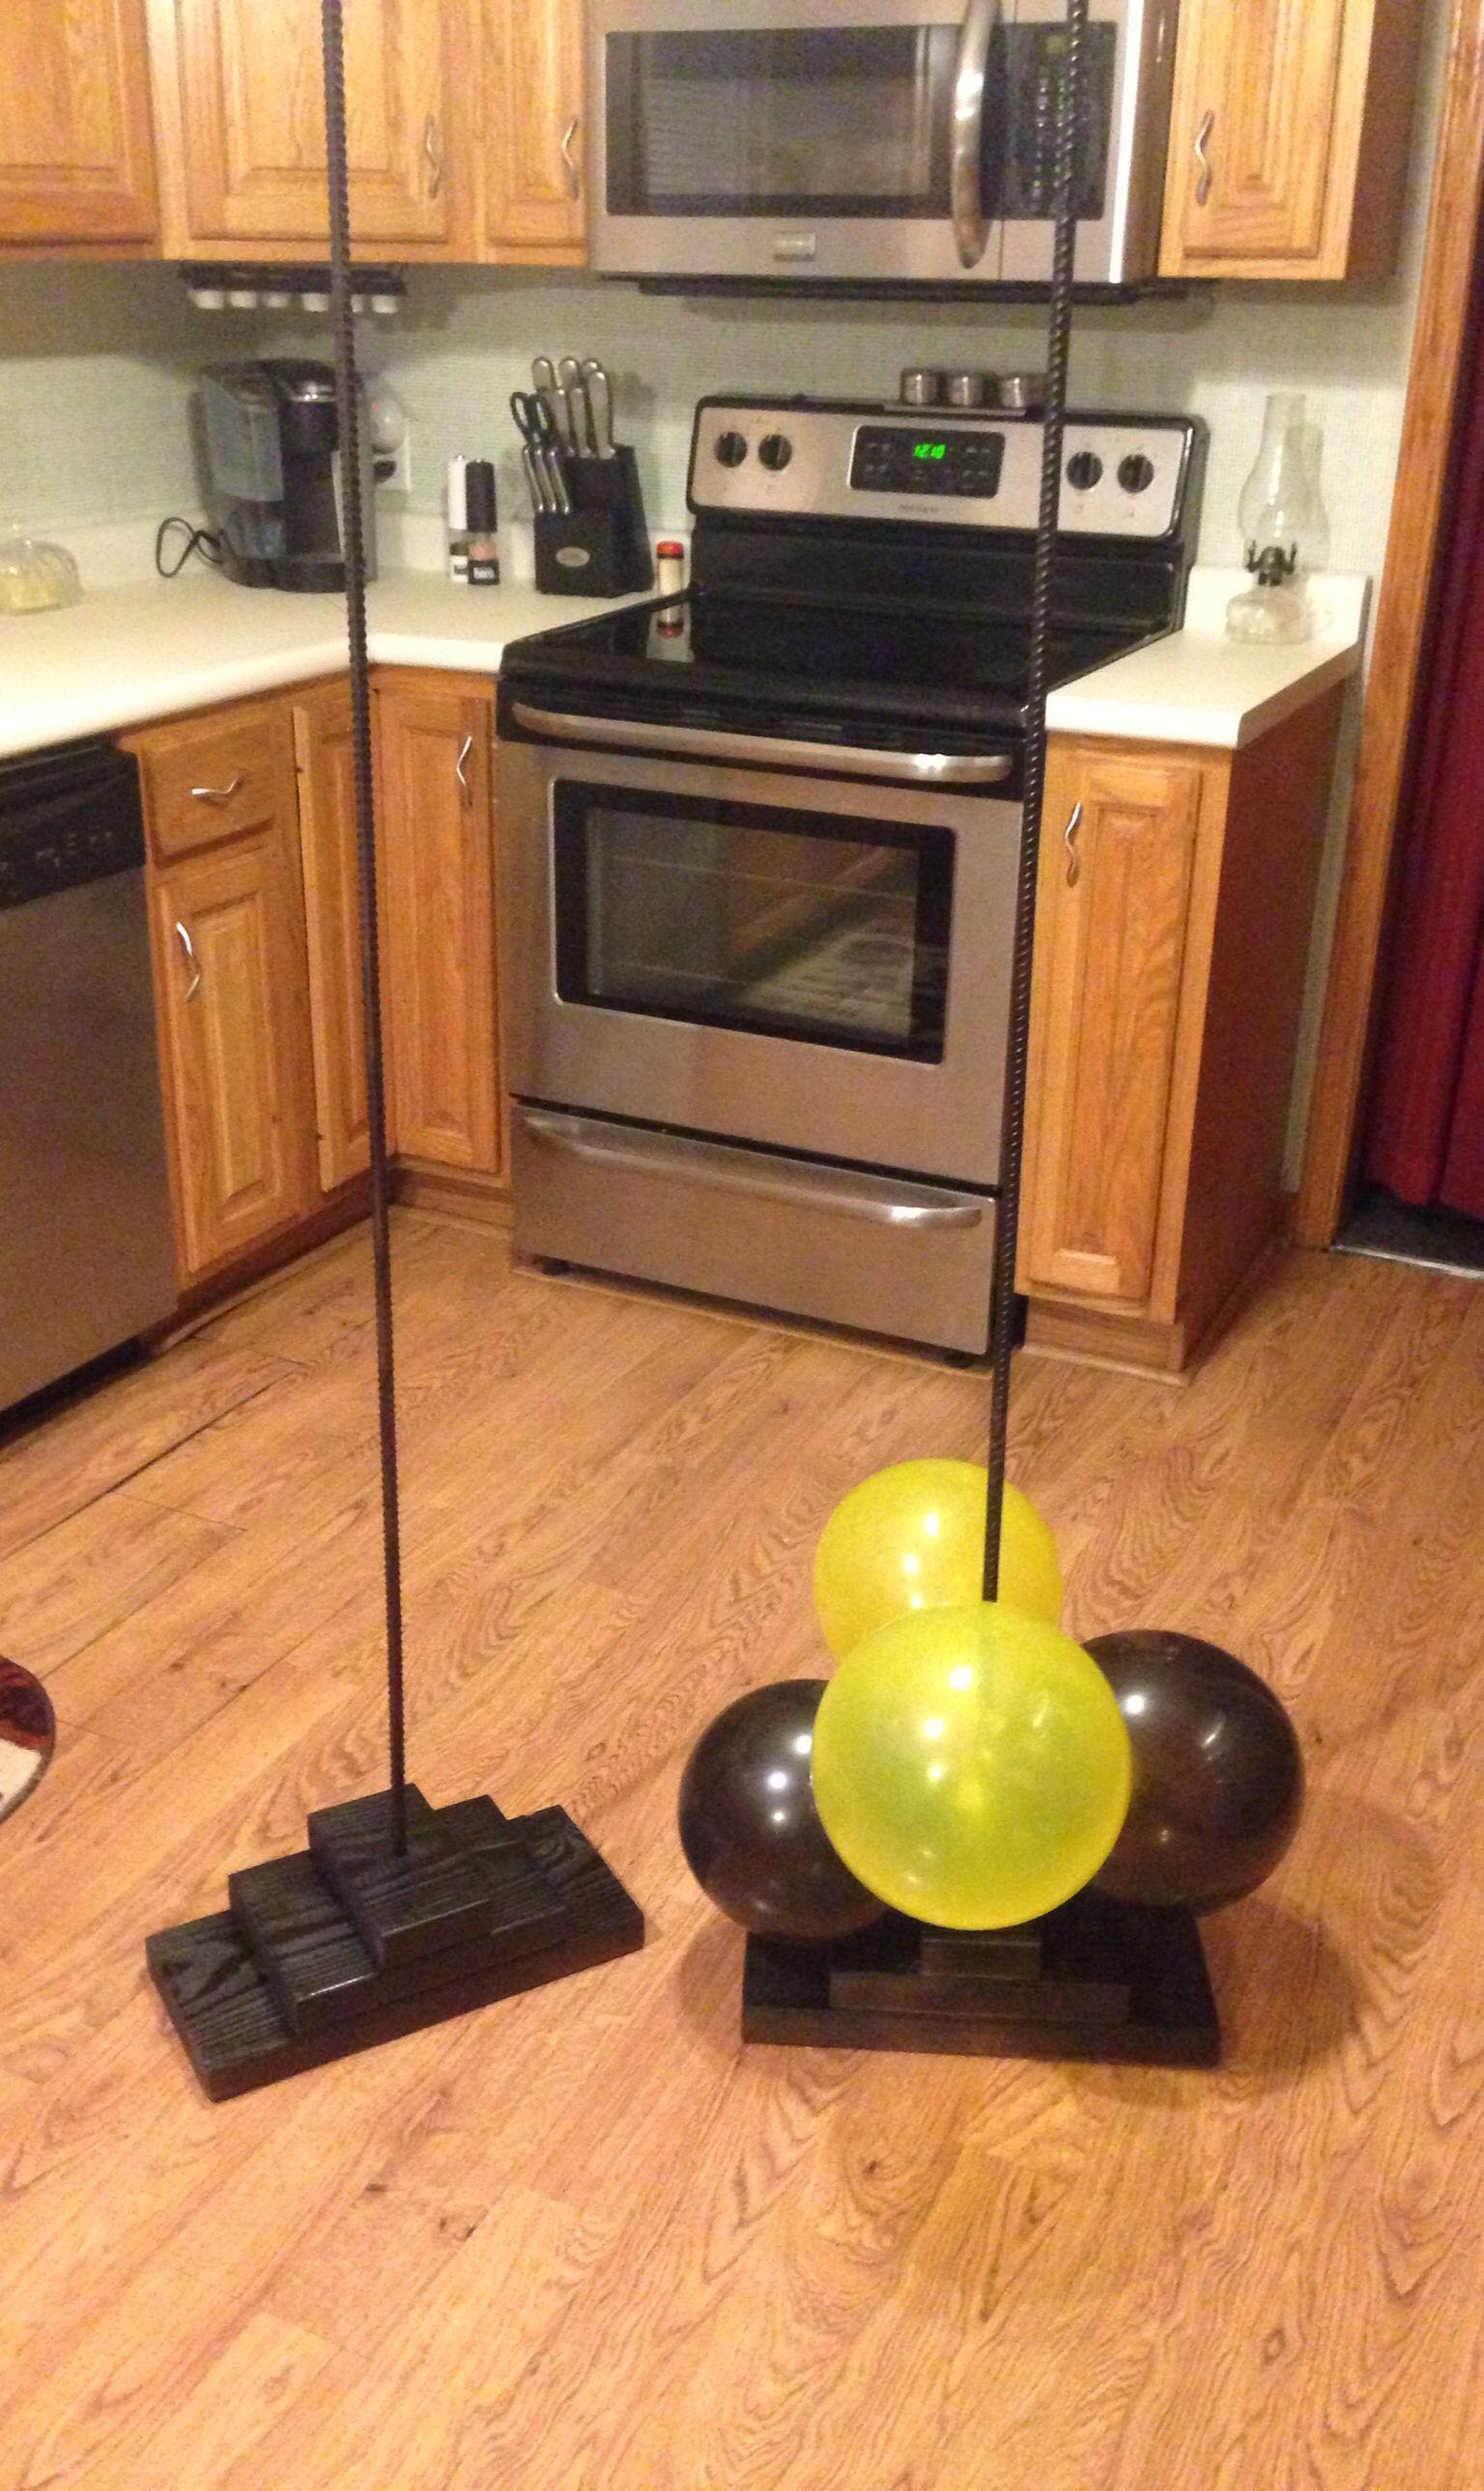 Diy balloon columns - Awesome Yet Easy To Diy Balloon Columns